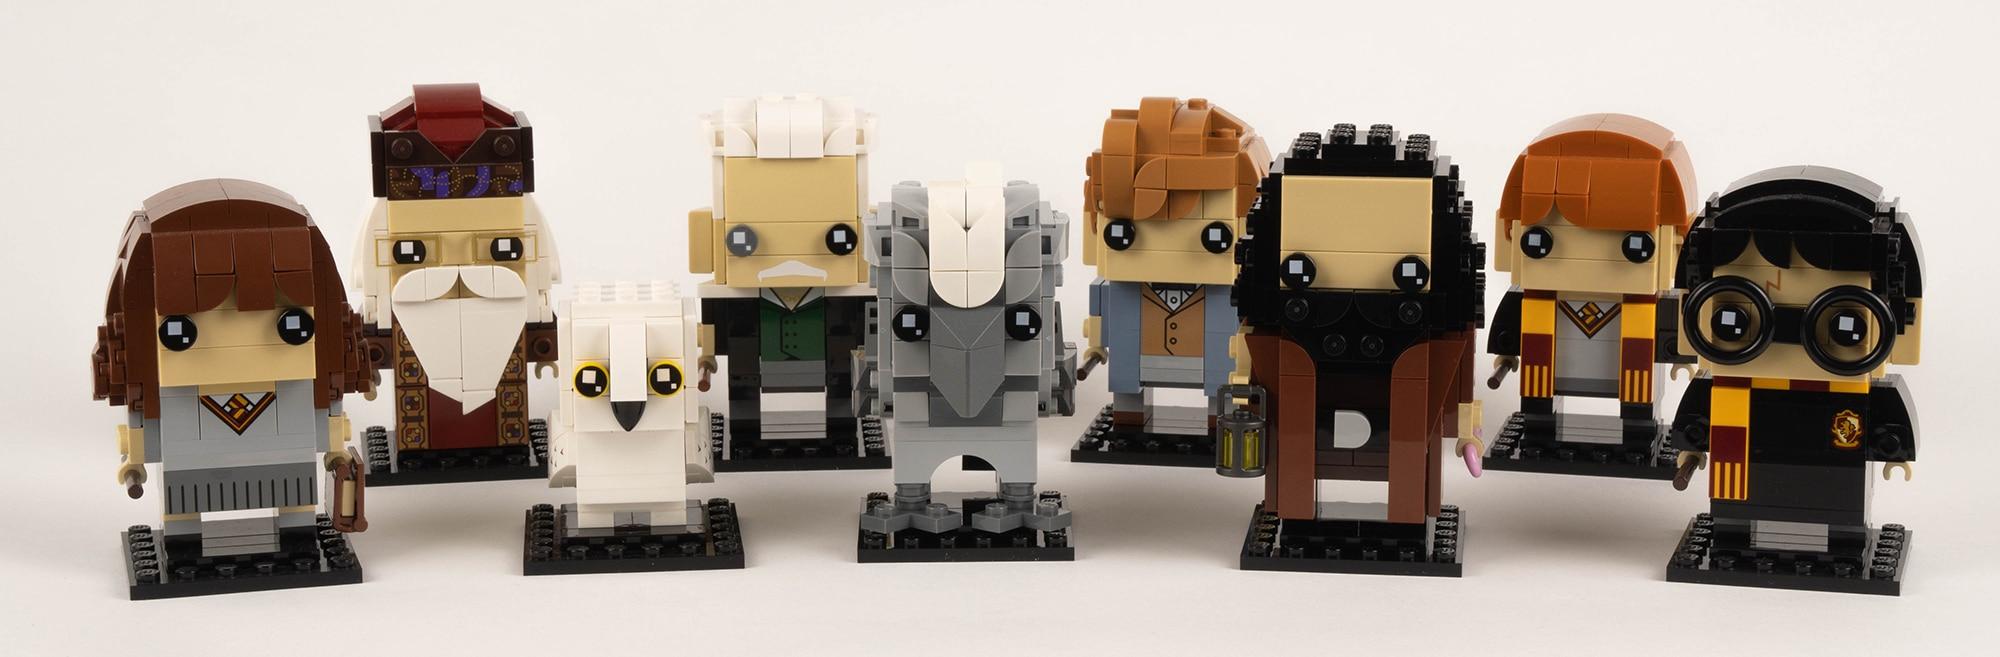 LEGO 40412 Hagrid Seidenschnabel Brickheadz Review 17